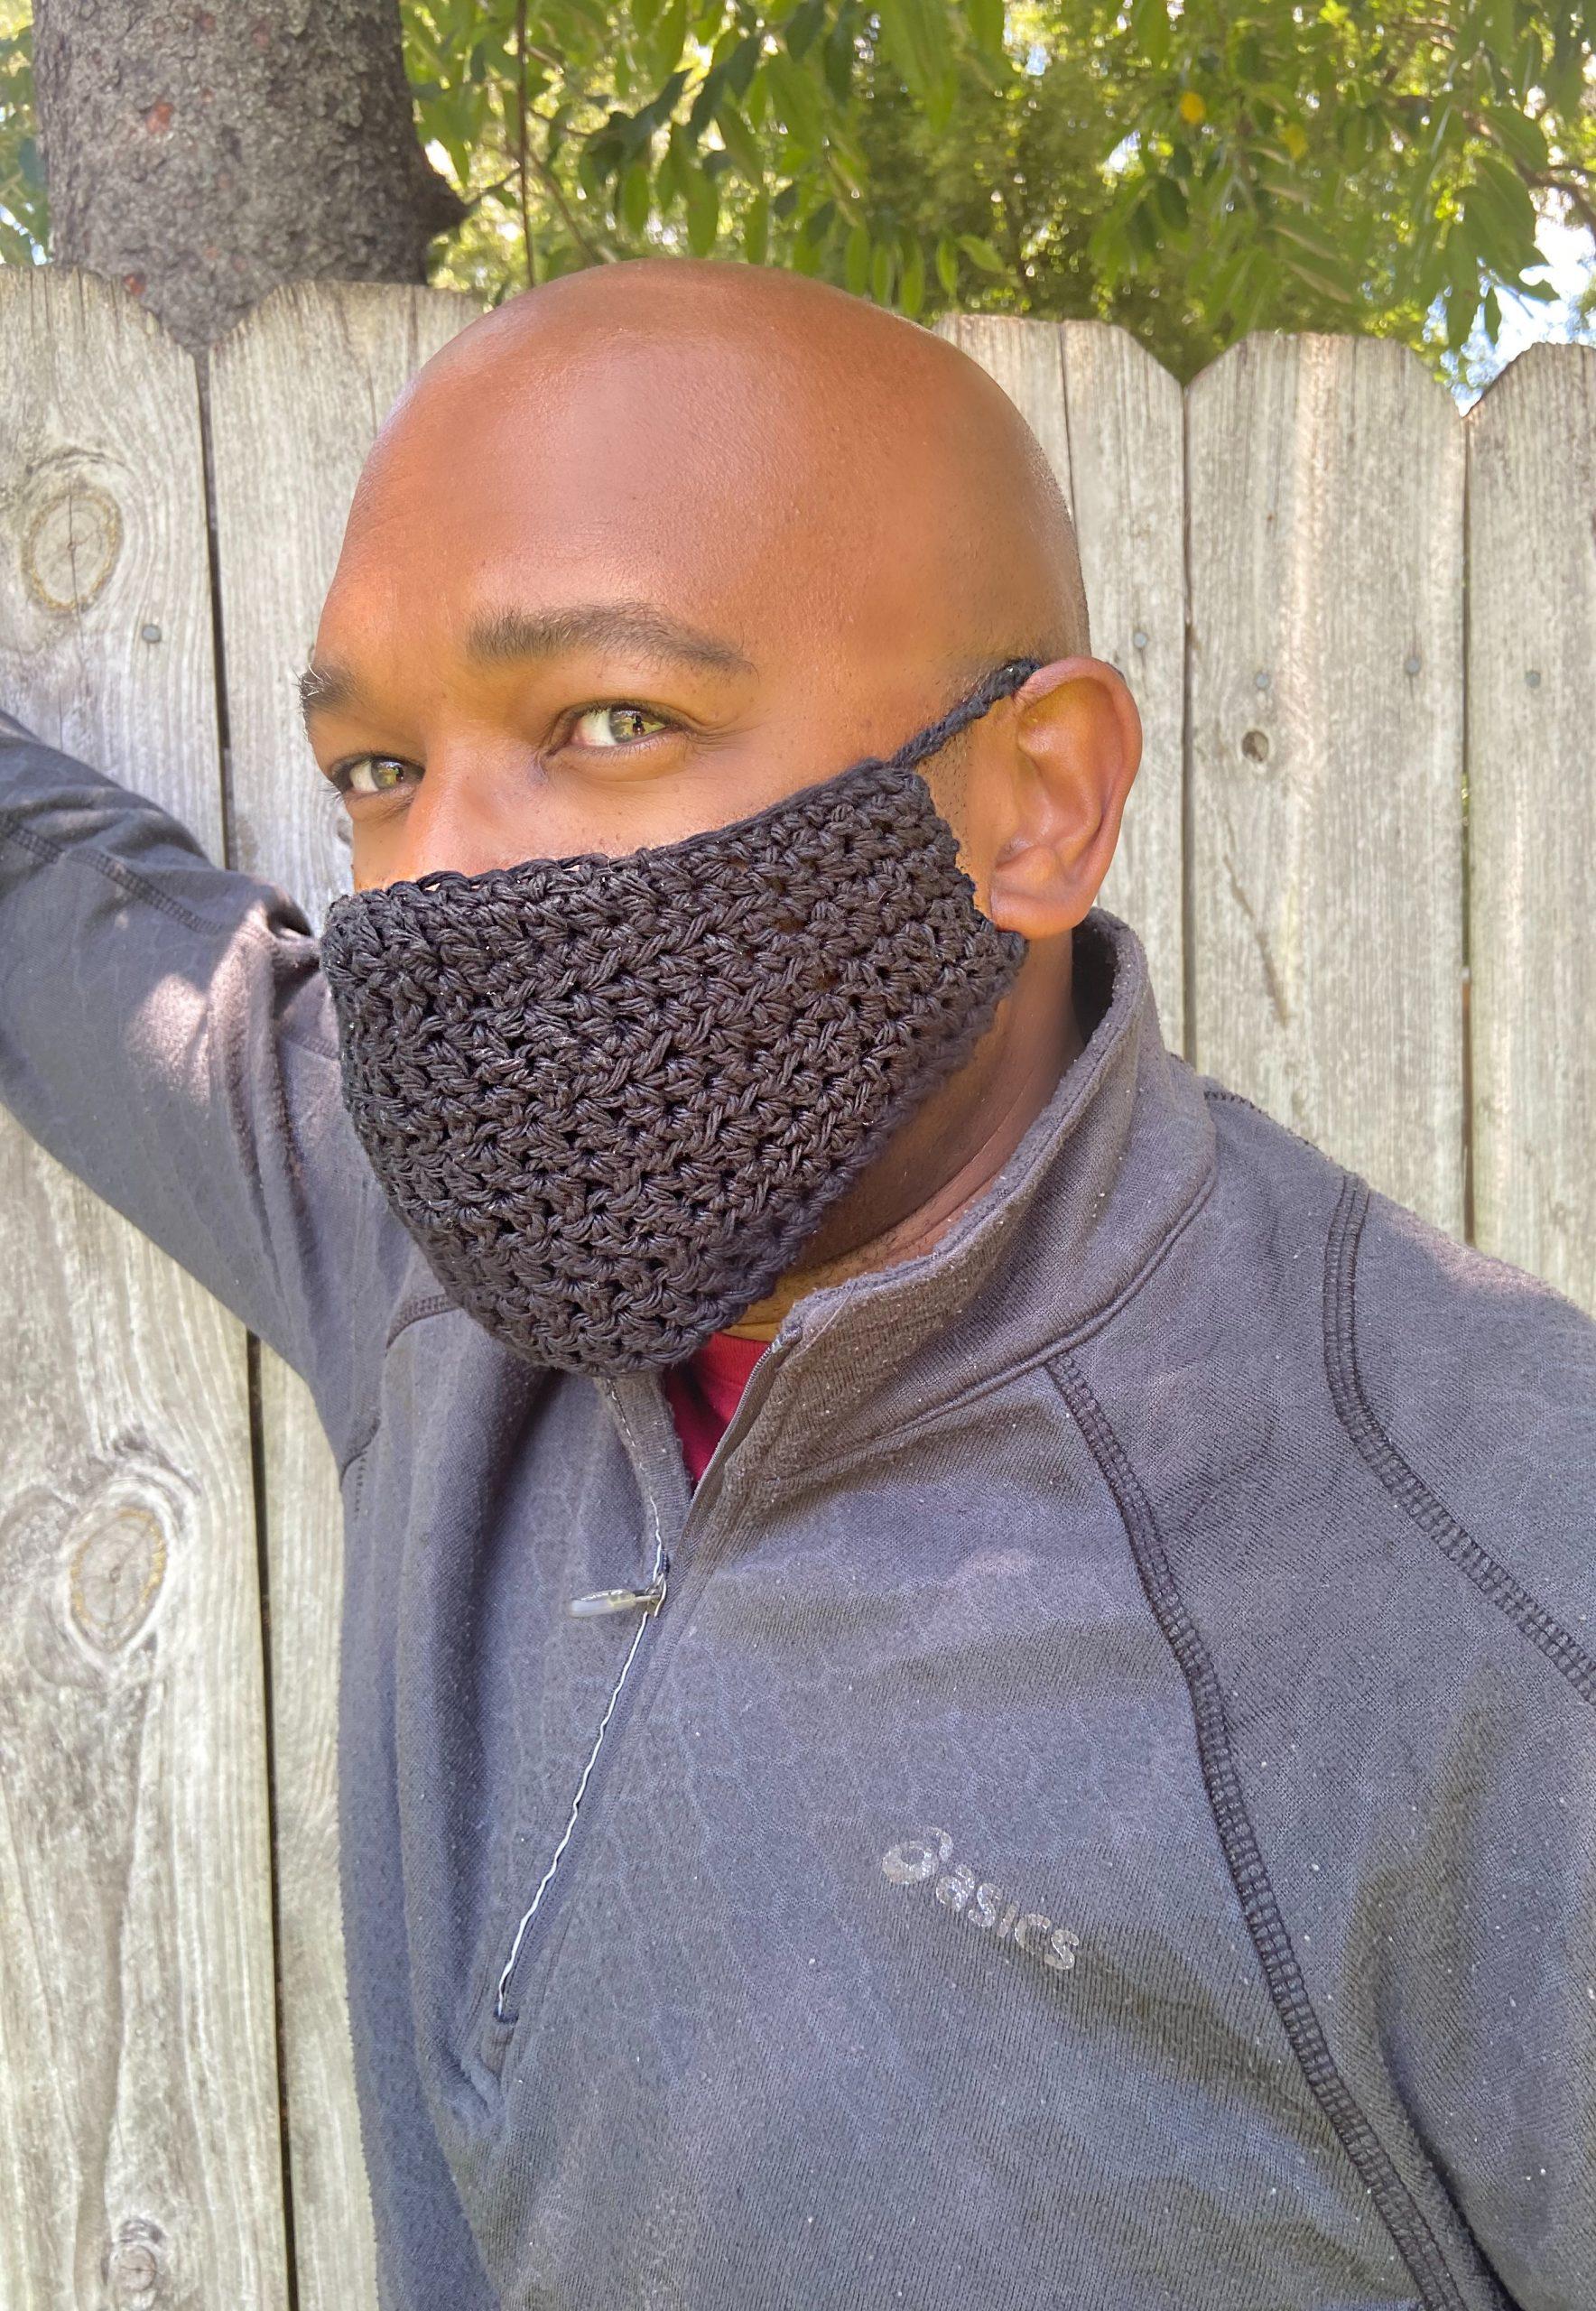 Crochet Mask with Pocket Filter